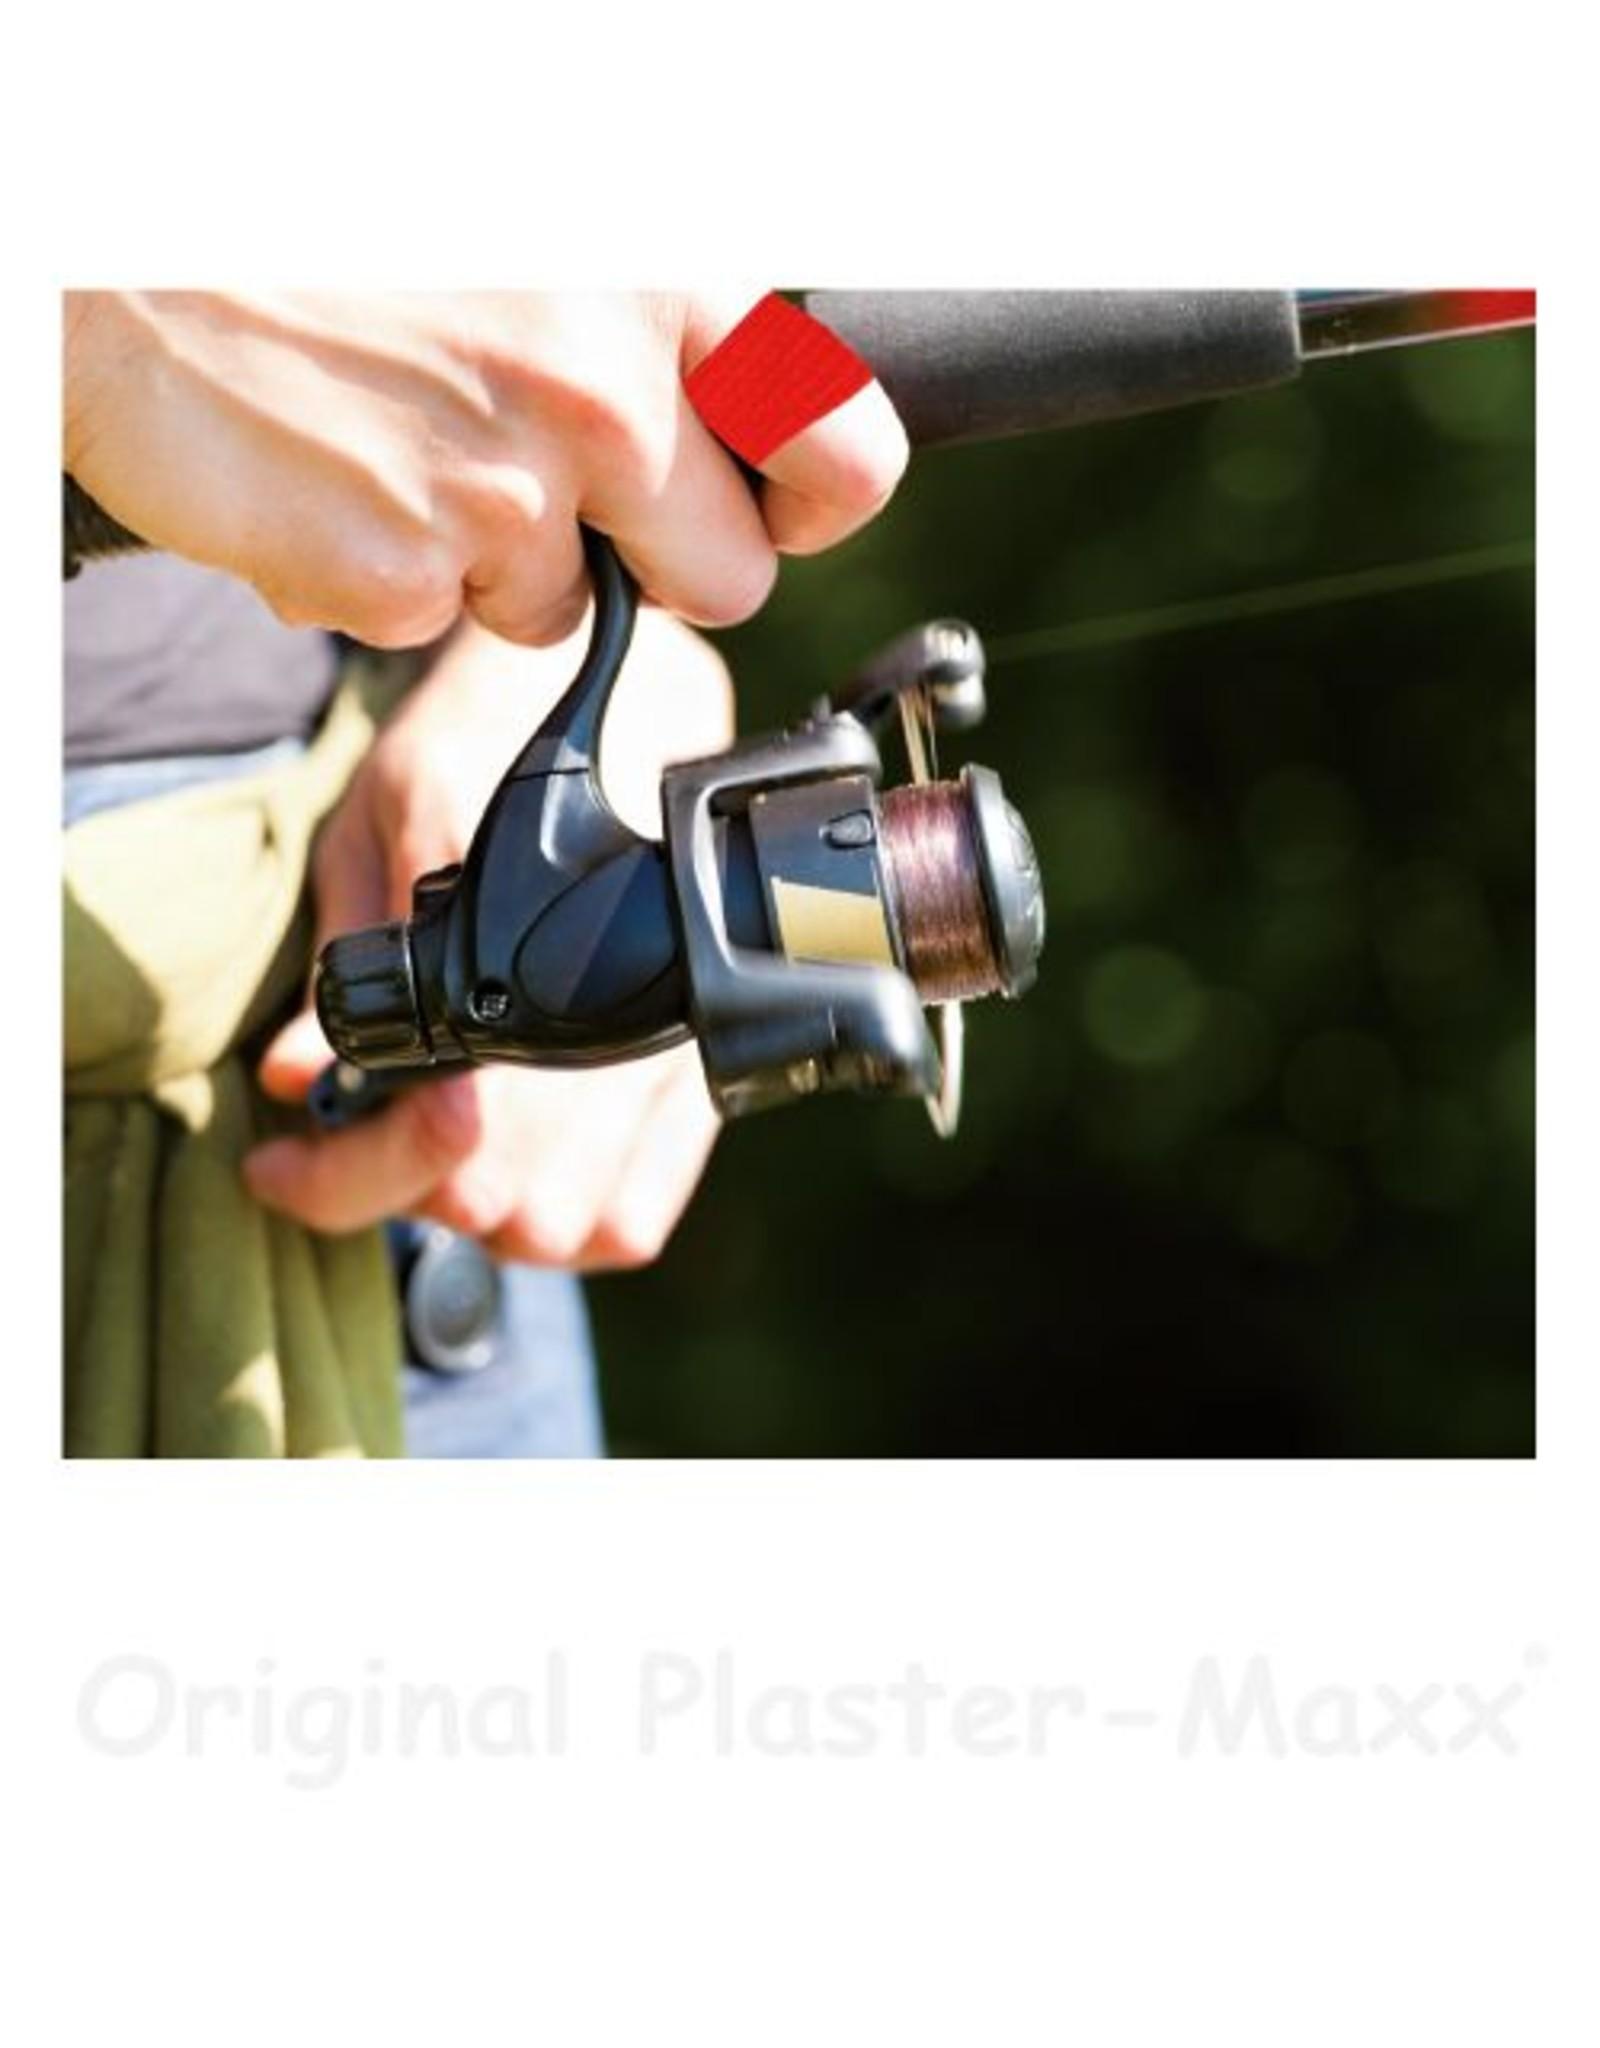 Plaster-Maxx Plaster-Maxx - Valueset 1xSkin, 1xViolet, 1xPink